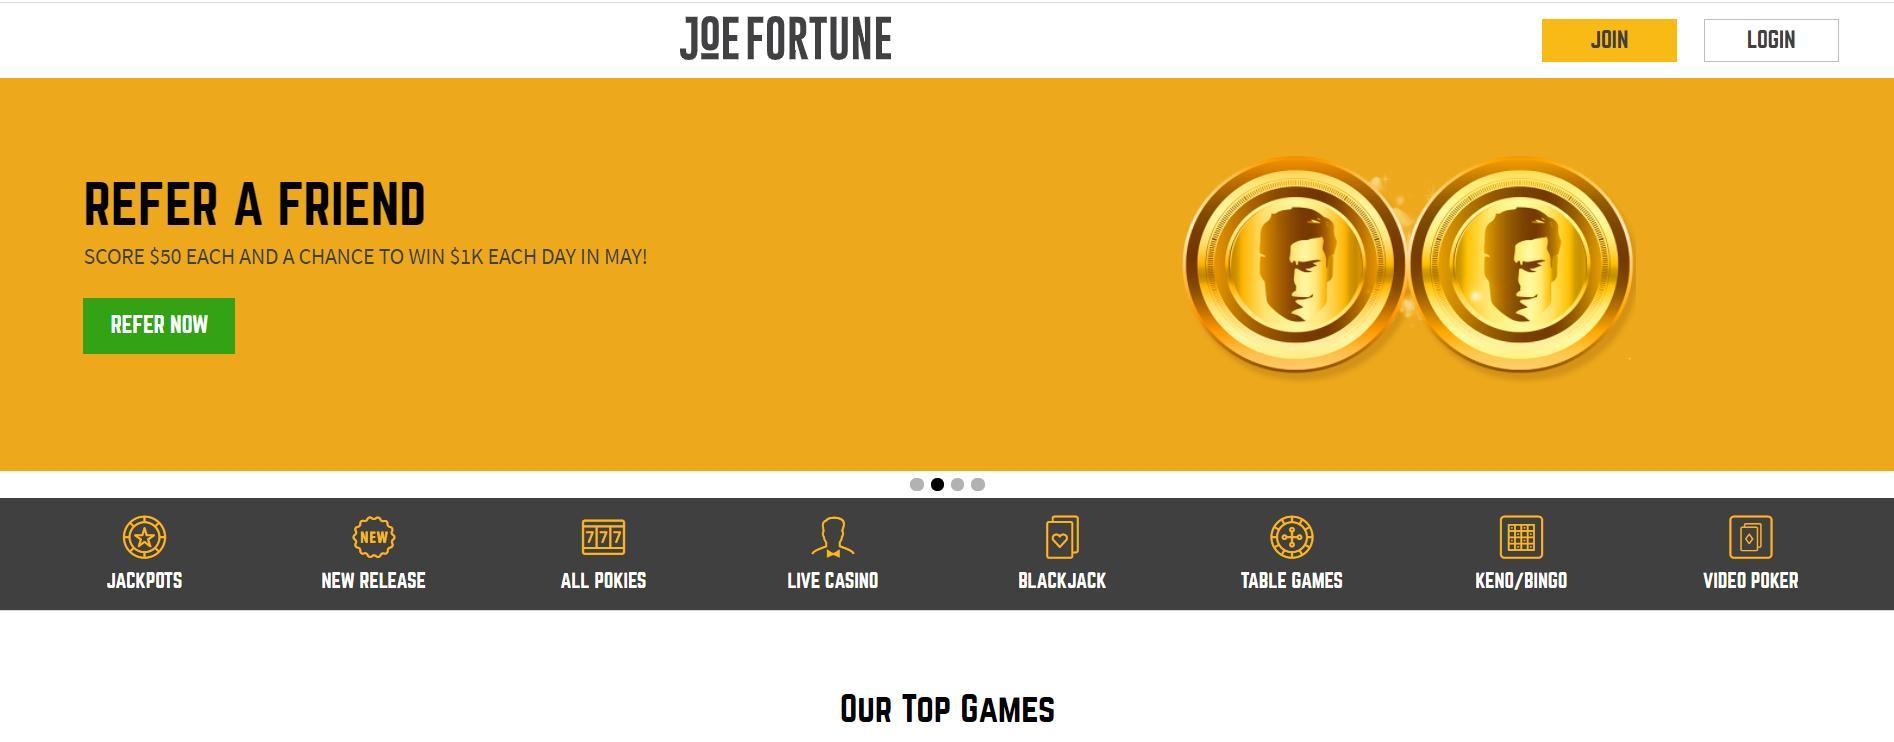 joe fortune choice of games